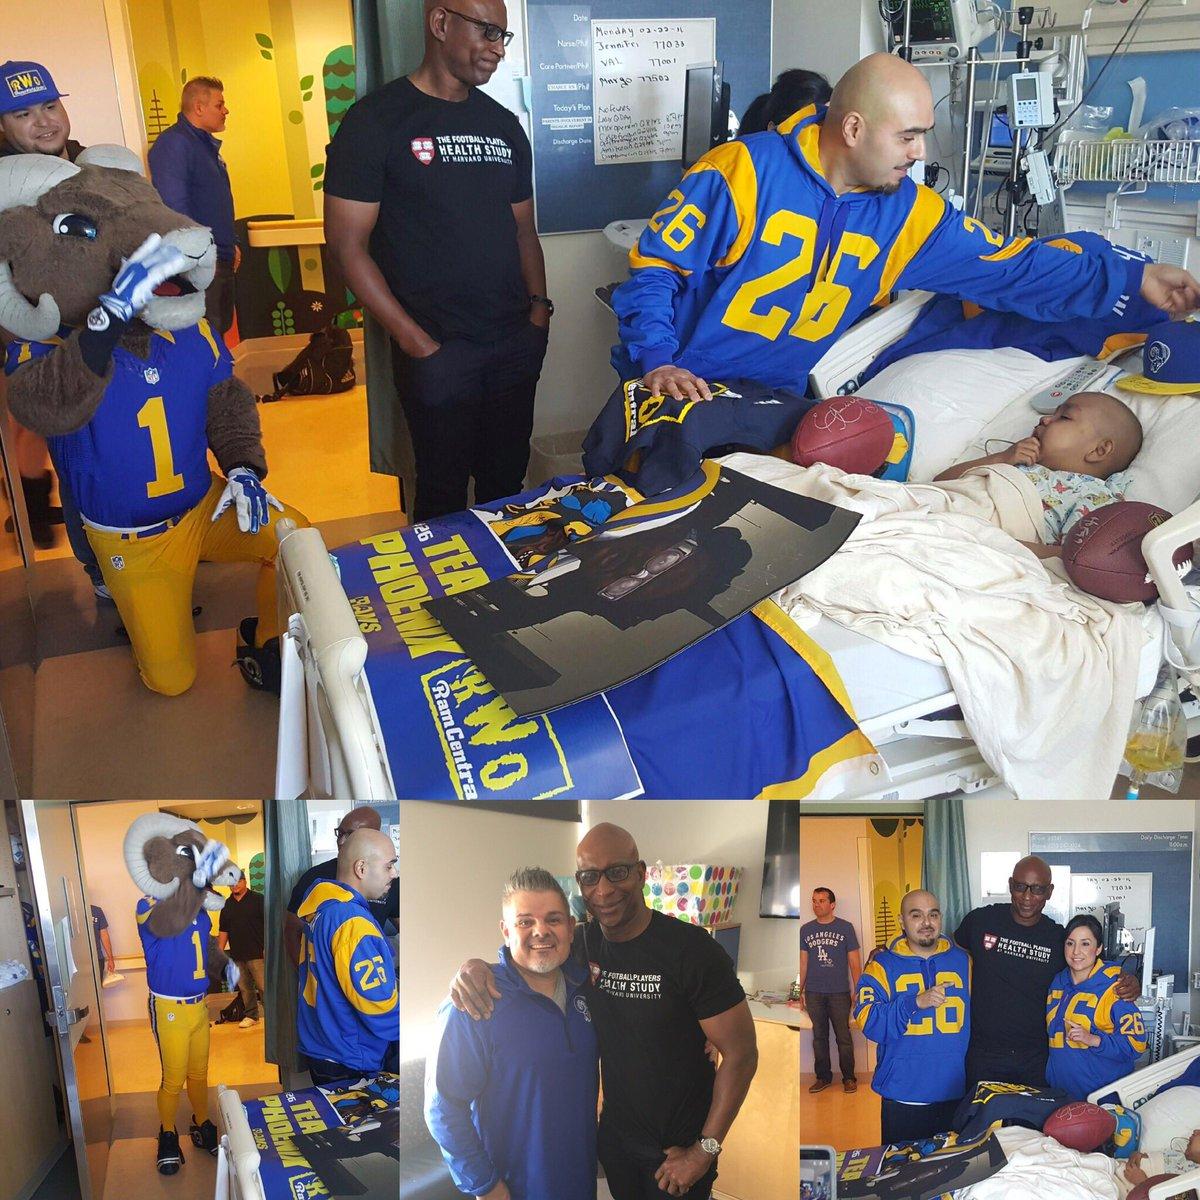 Thank U @EricDickerson @LARamsClub @throwbackjoe66 for visiting 5yo Phoenix, a patient @MCHUCLA & big @RamsNFL fan! https://t.co/yi7Fzn5tUq